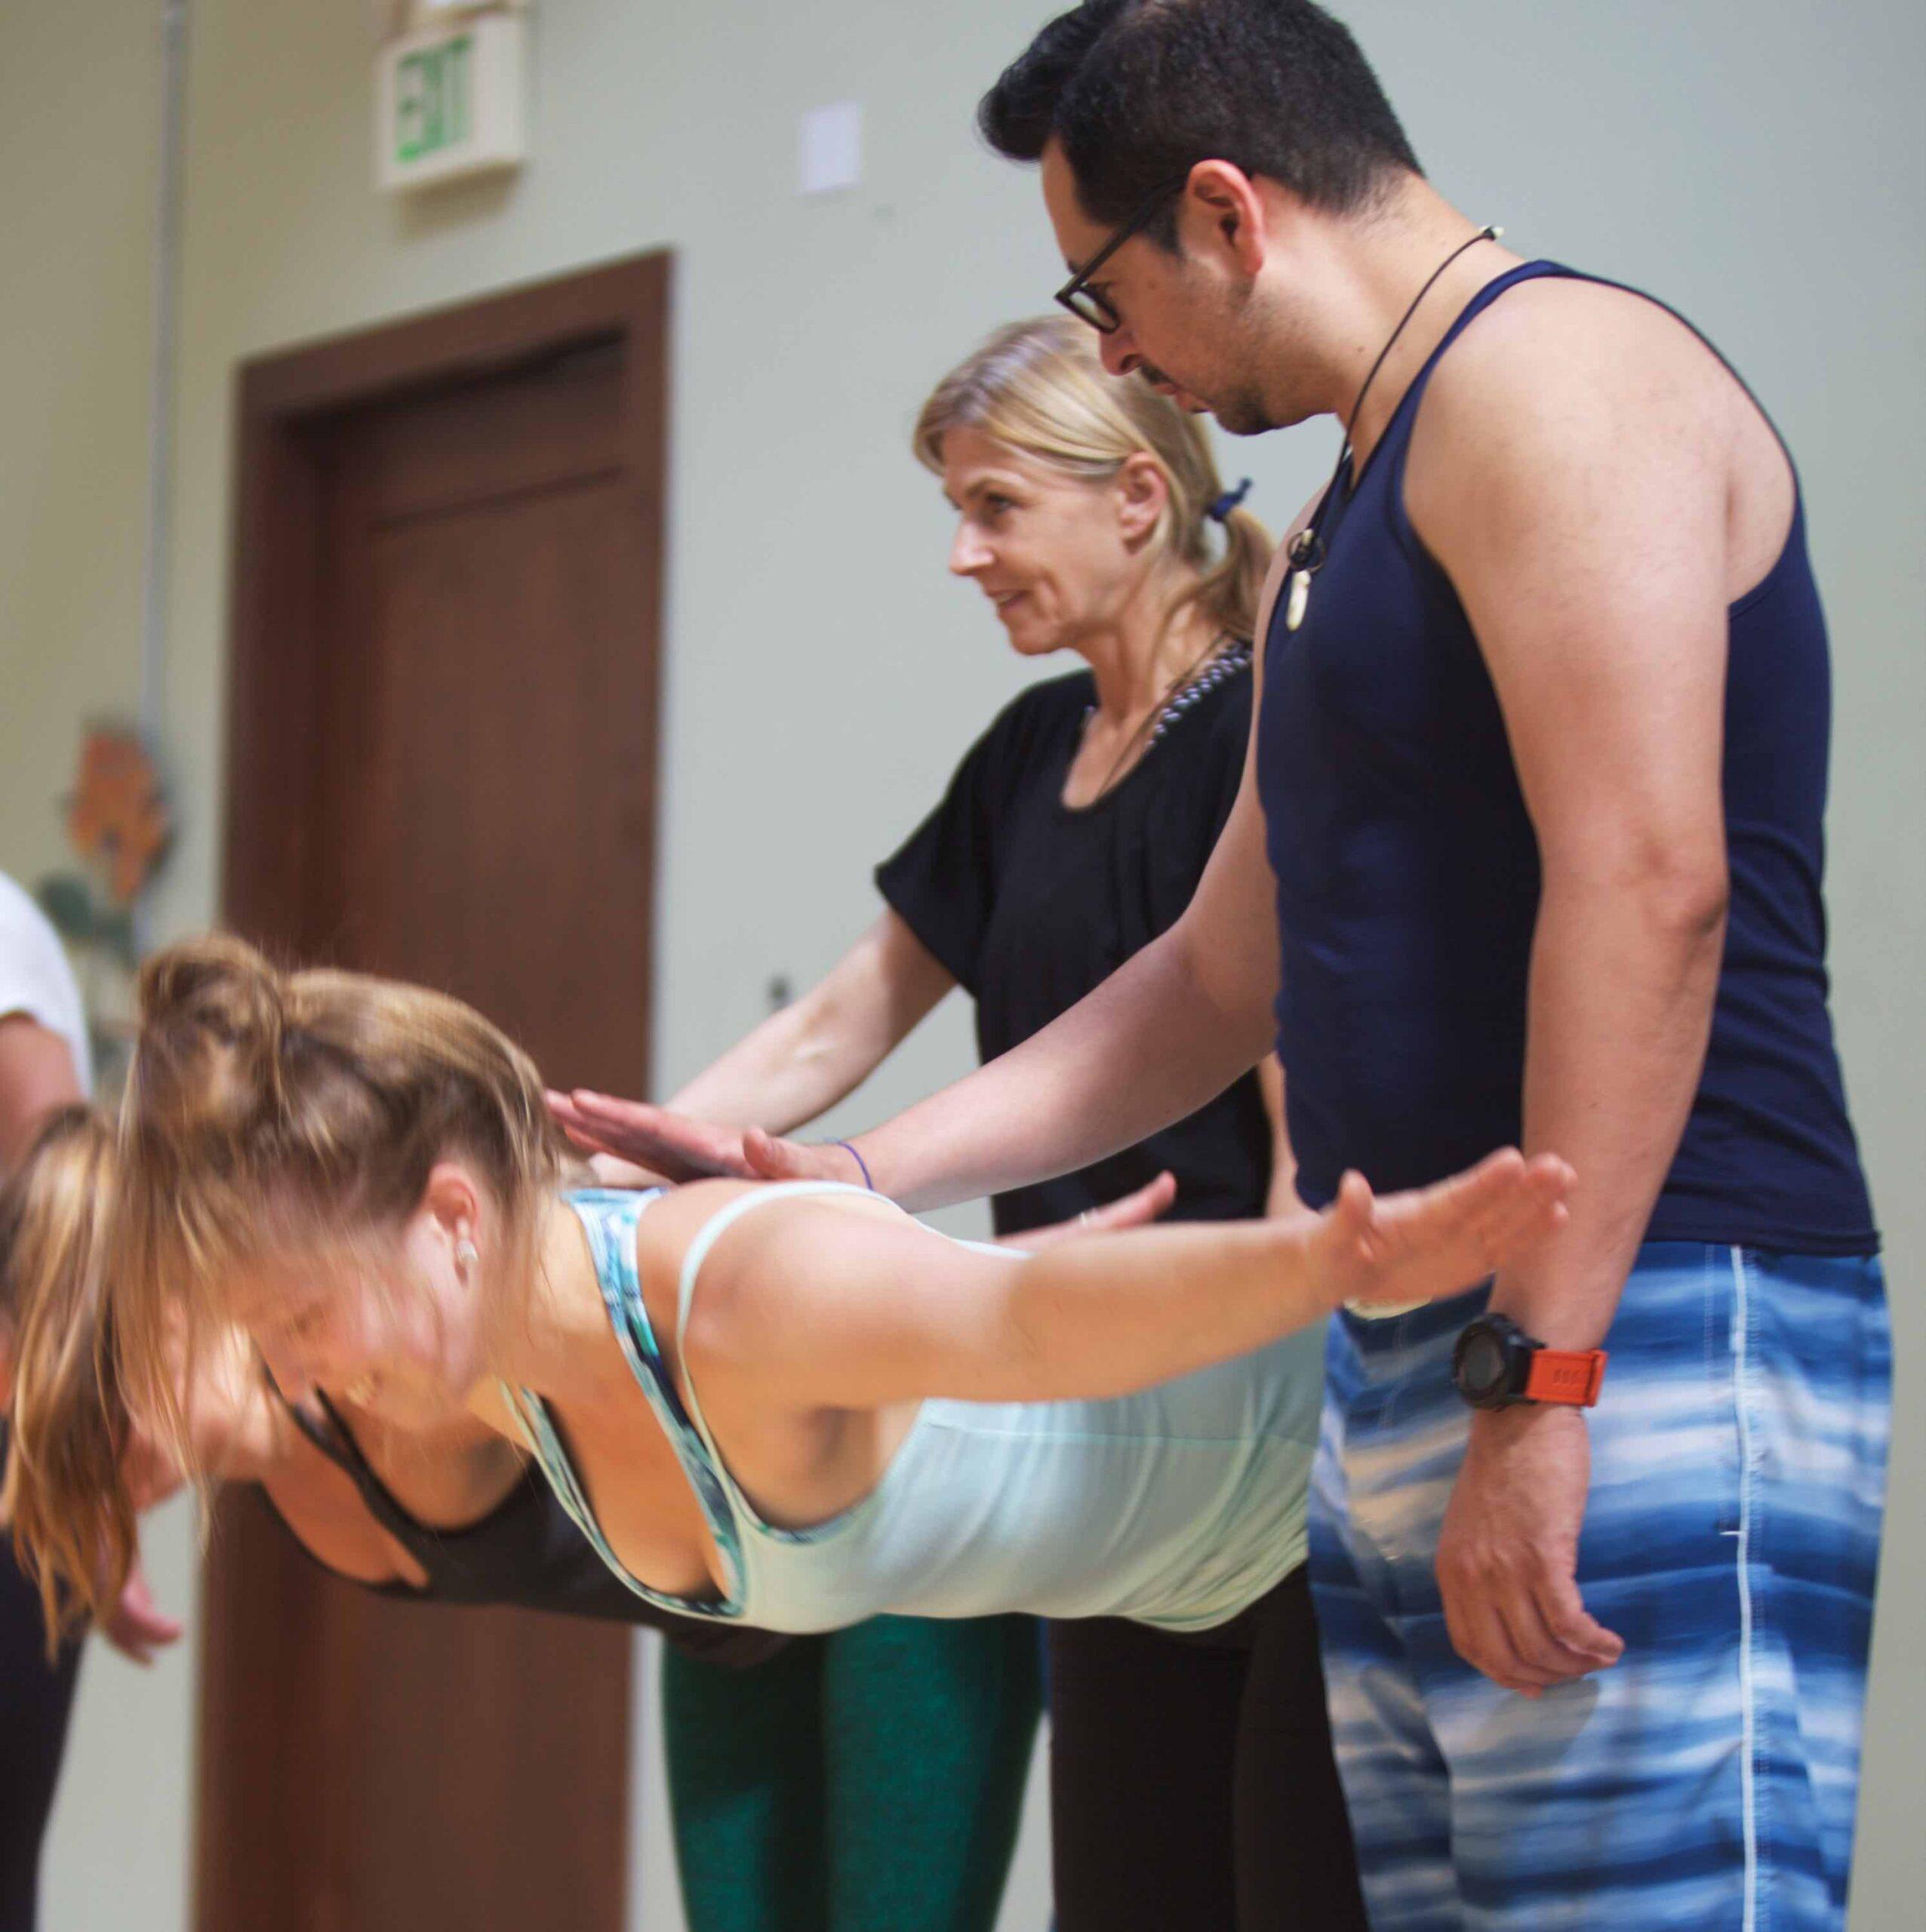 yoga teachers in training class